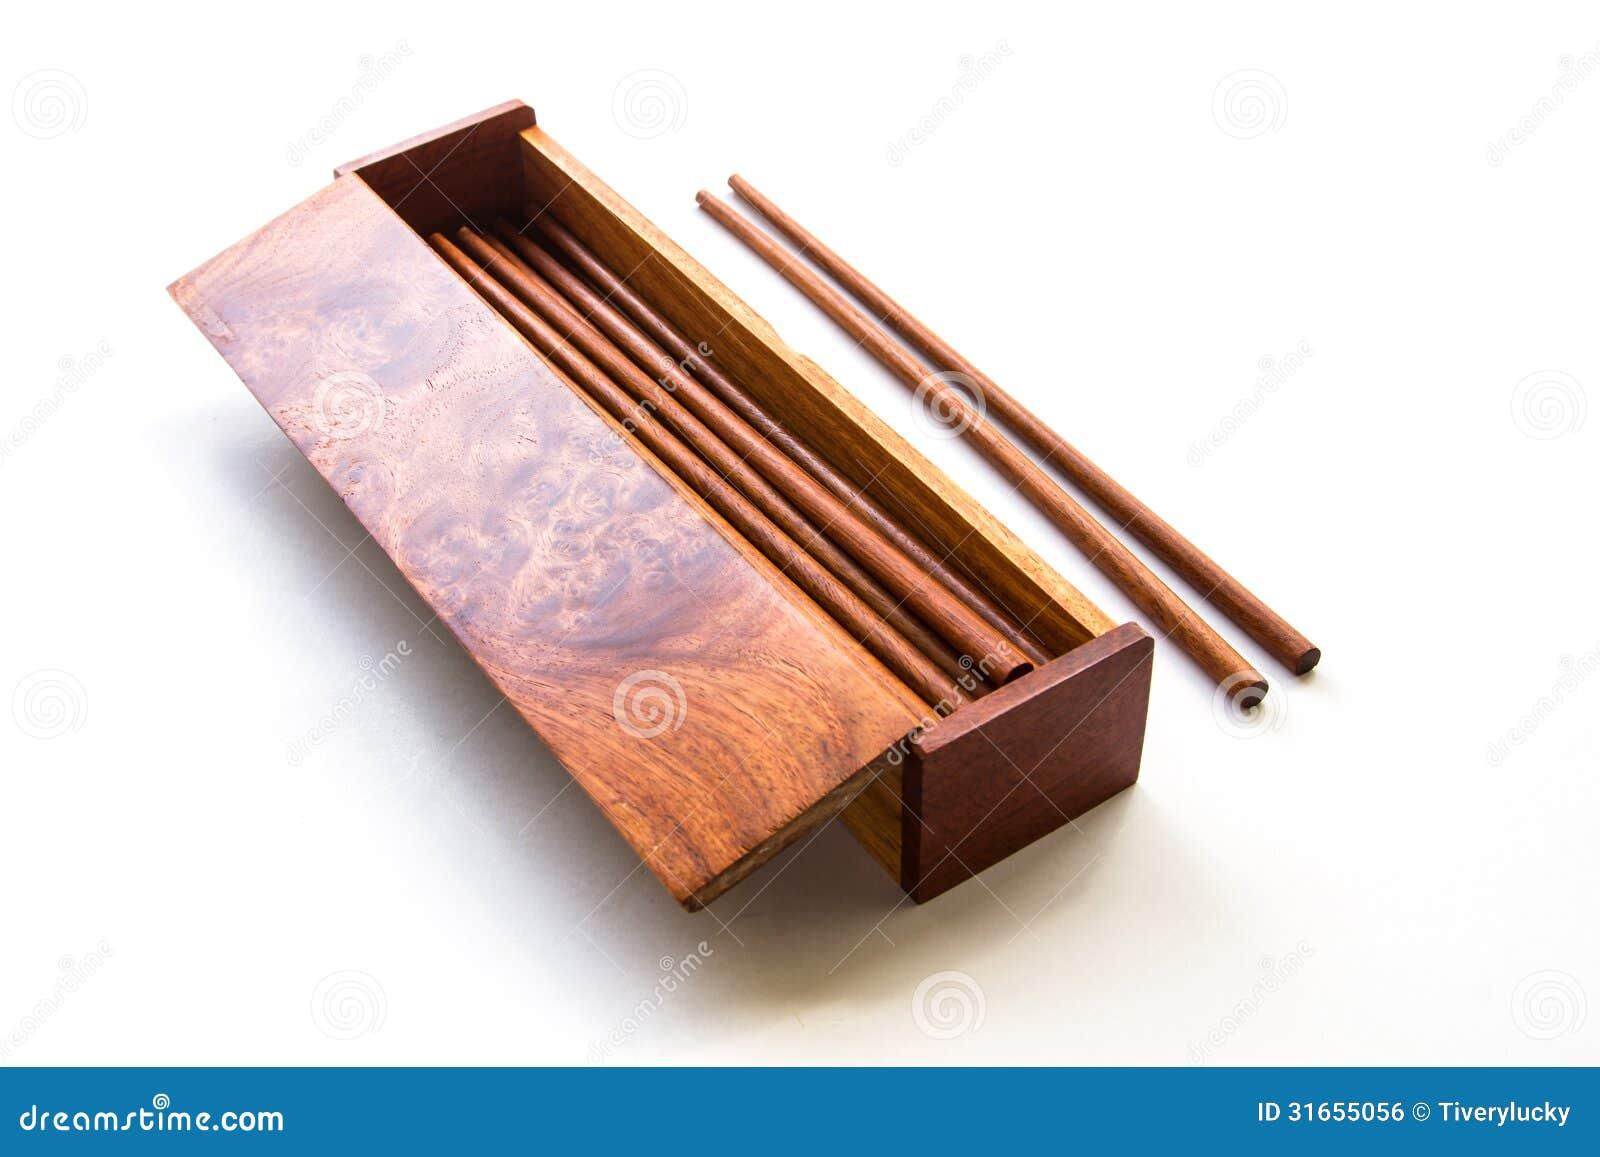 Chinese Food Box And Chopsticks